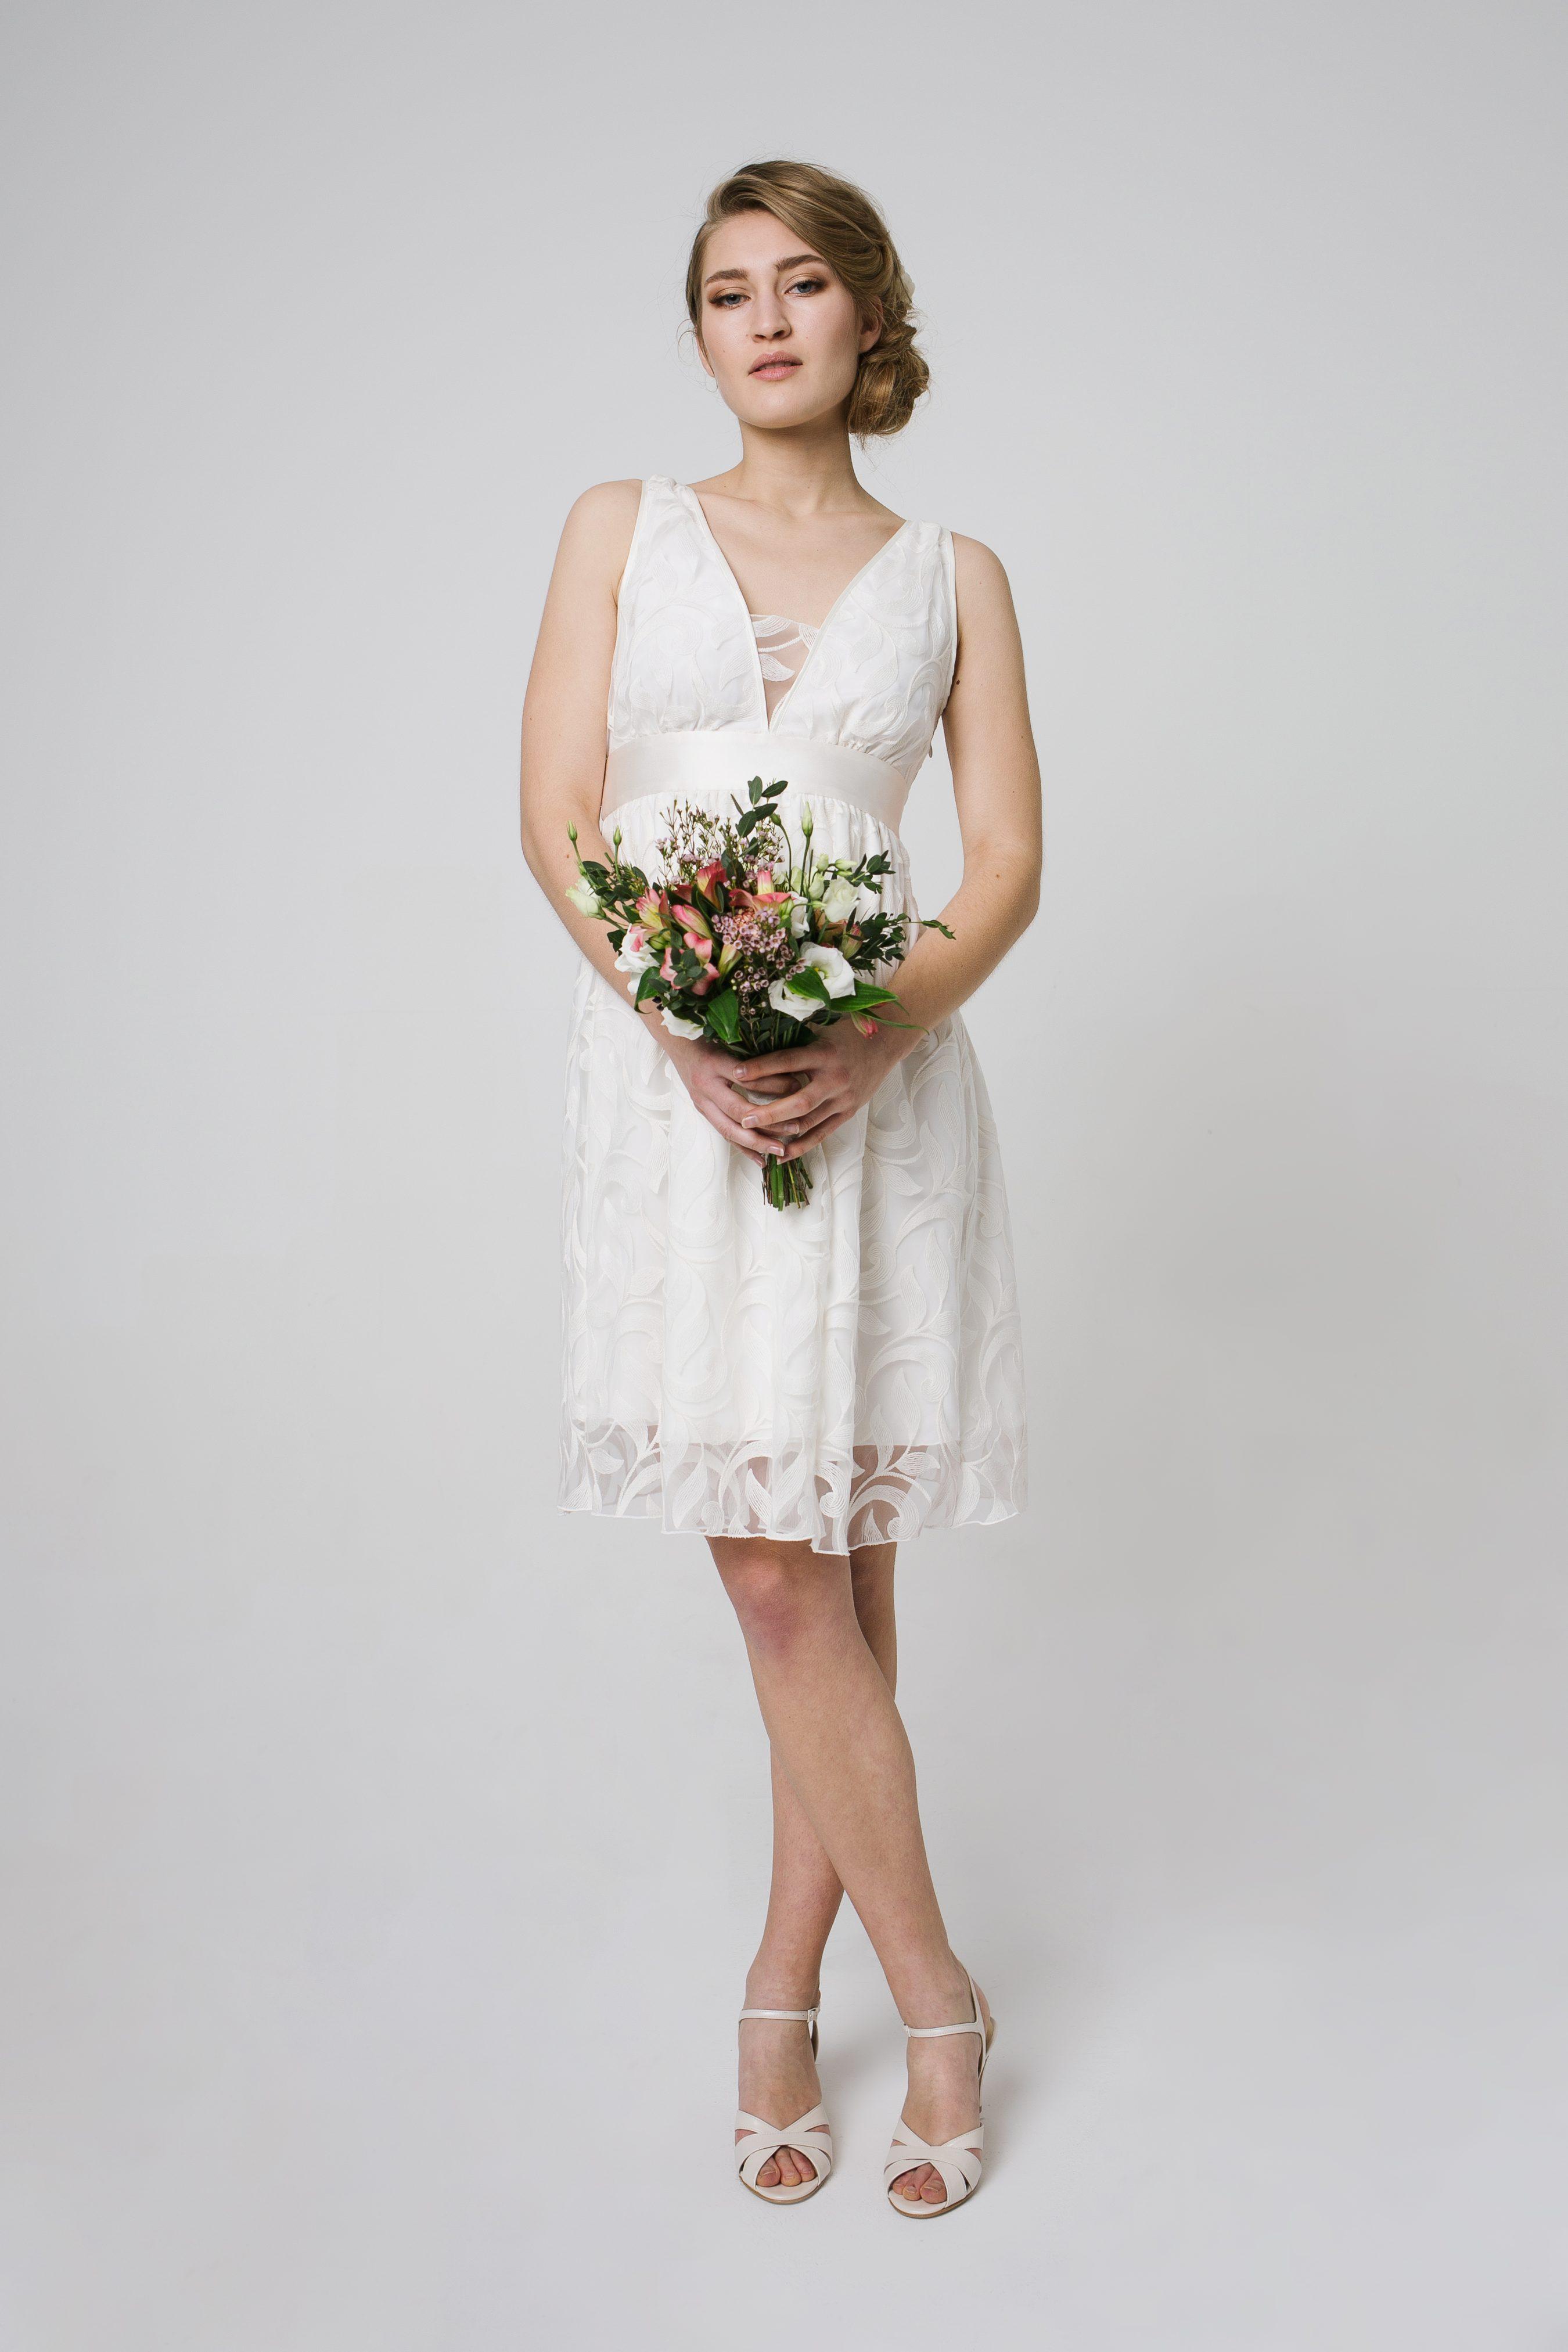 Brautkleid kurz Standesamt